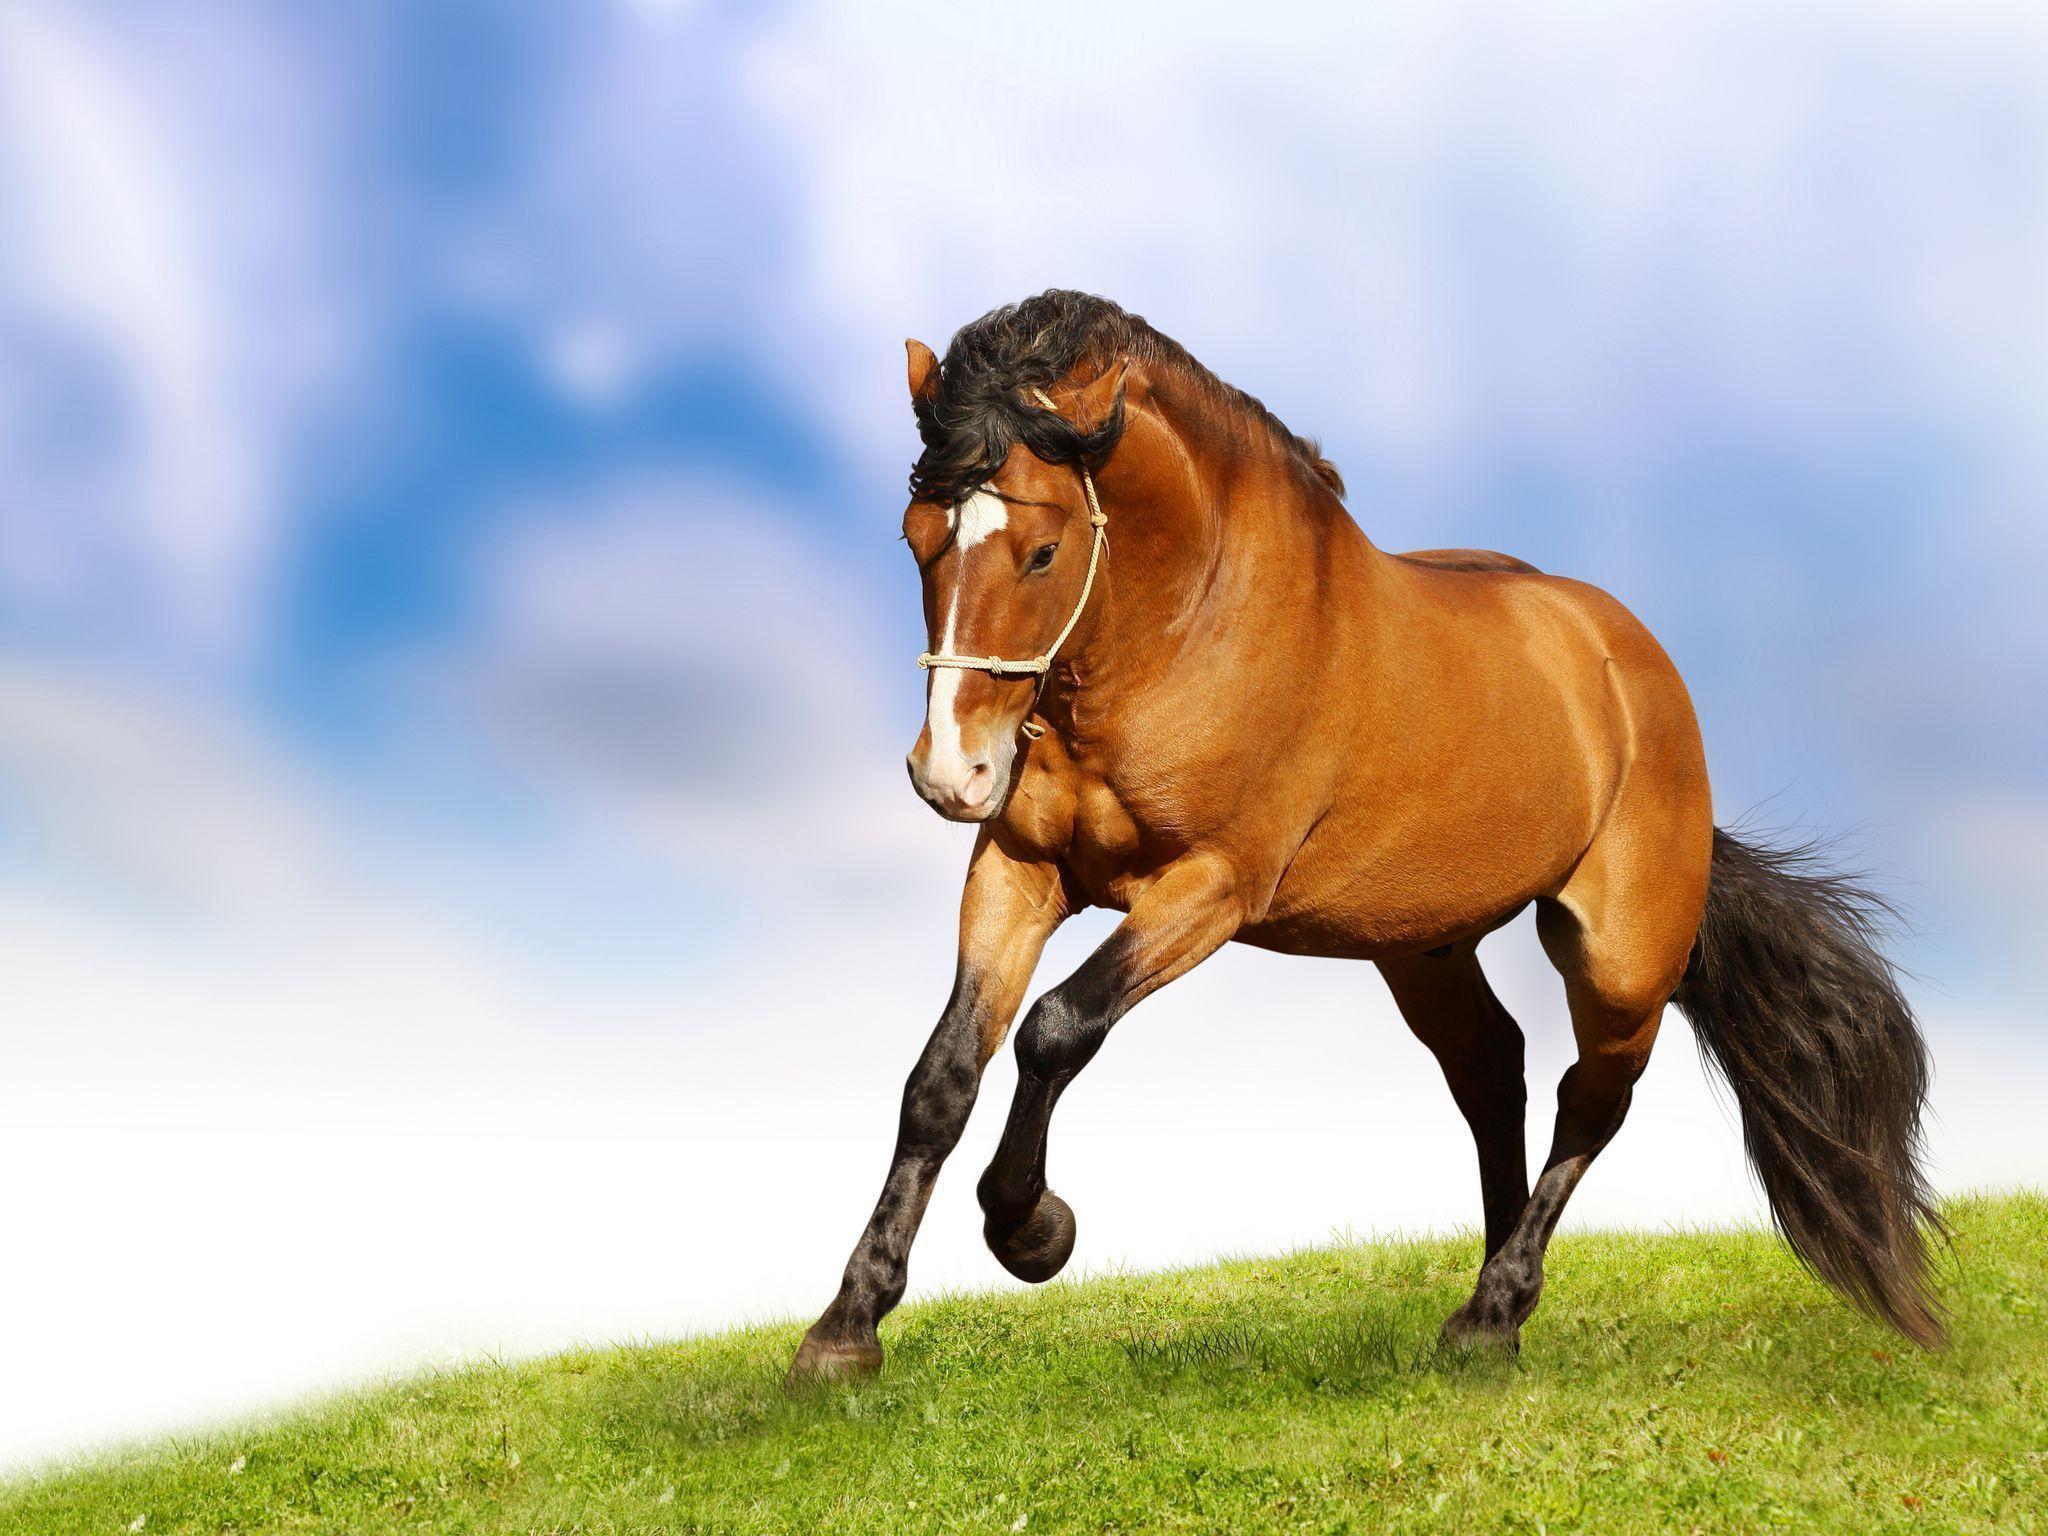 Horse Wallpaper for Home - HD Wallpapers|WallForU.com